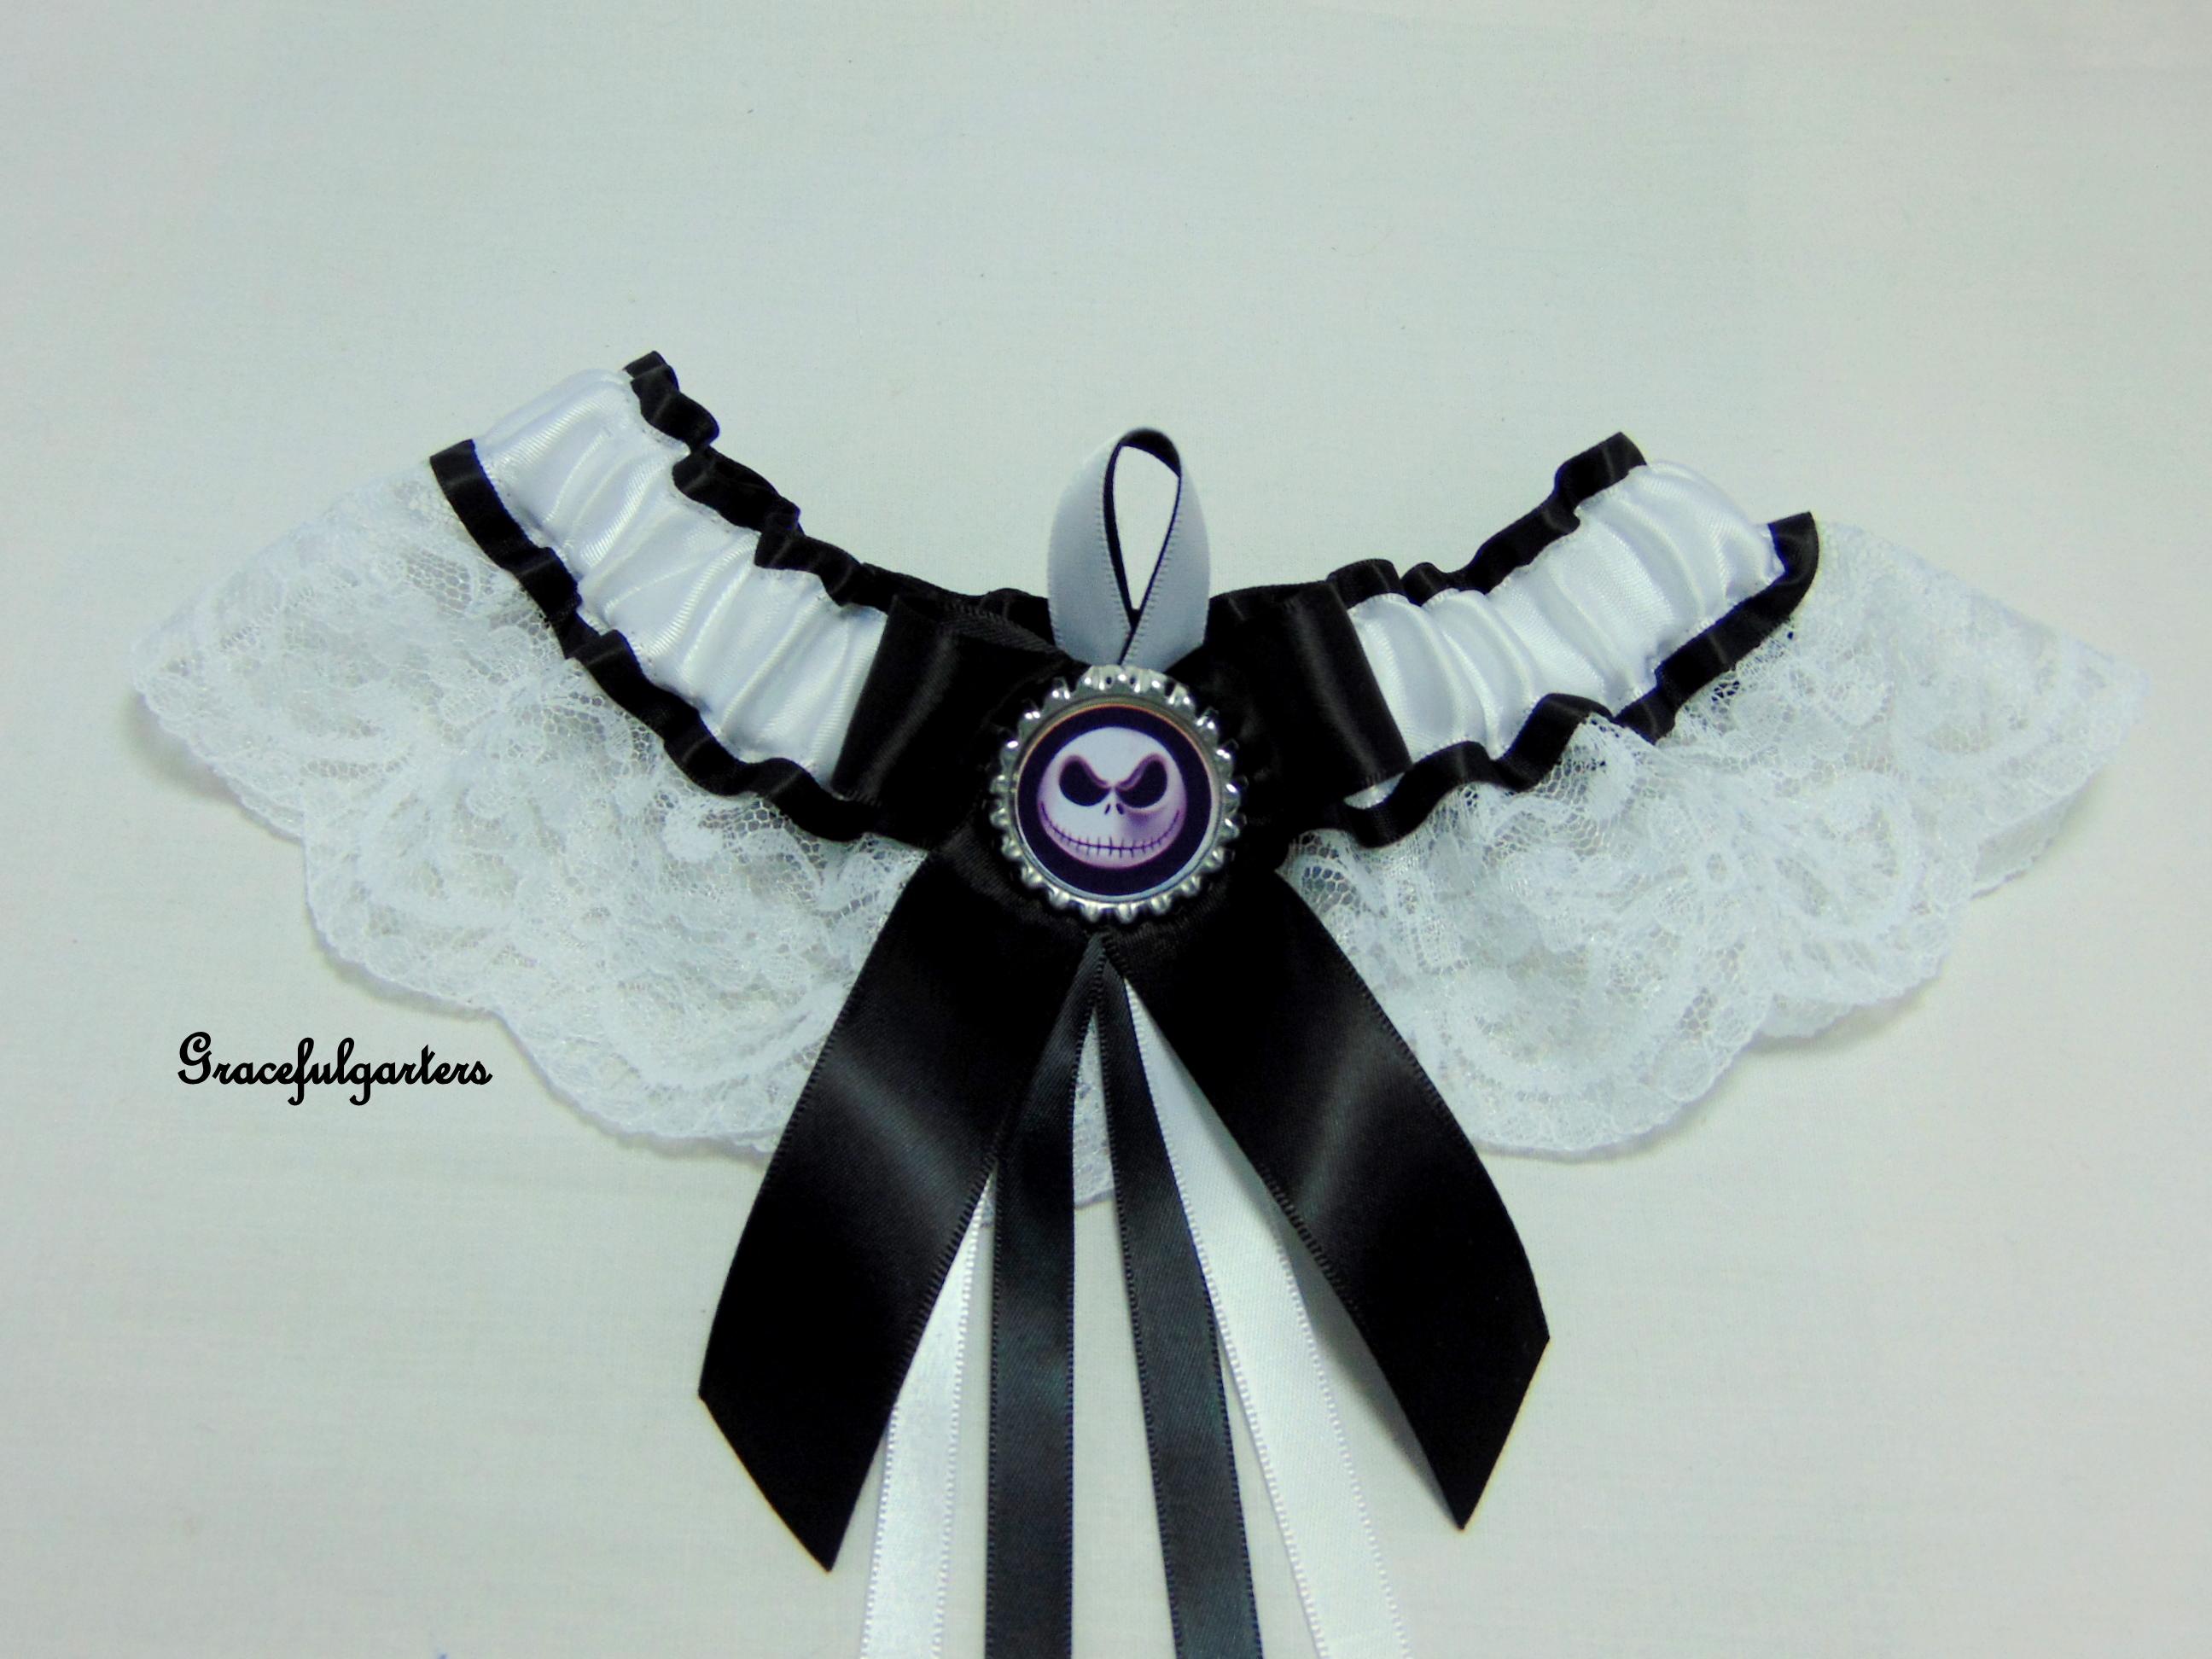 Jack Skellington Nightmare Before Christmas Lace Bridal Wedding Garter